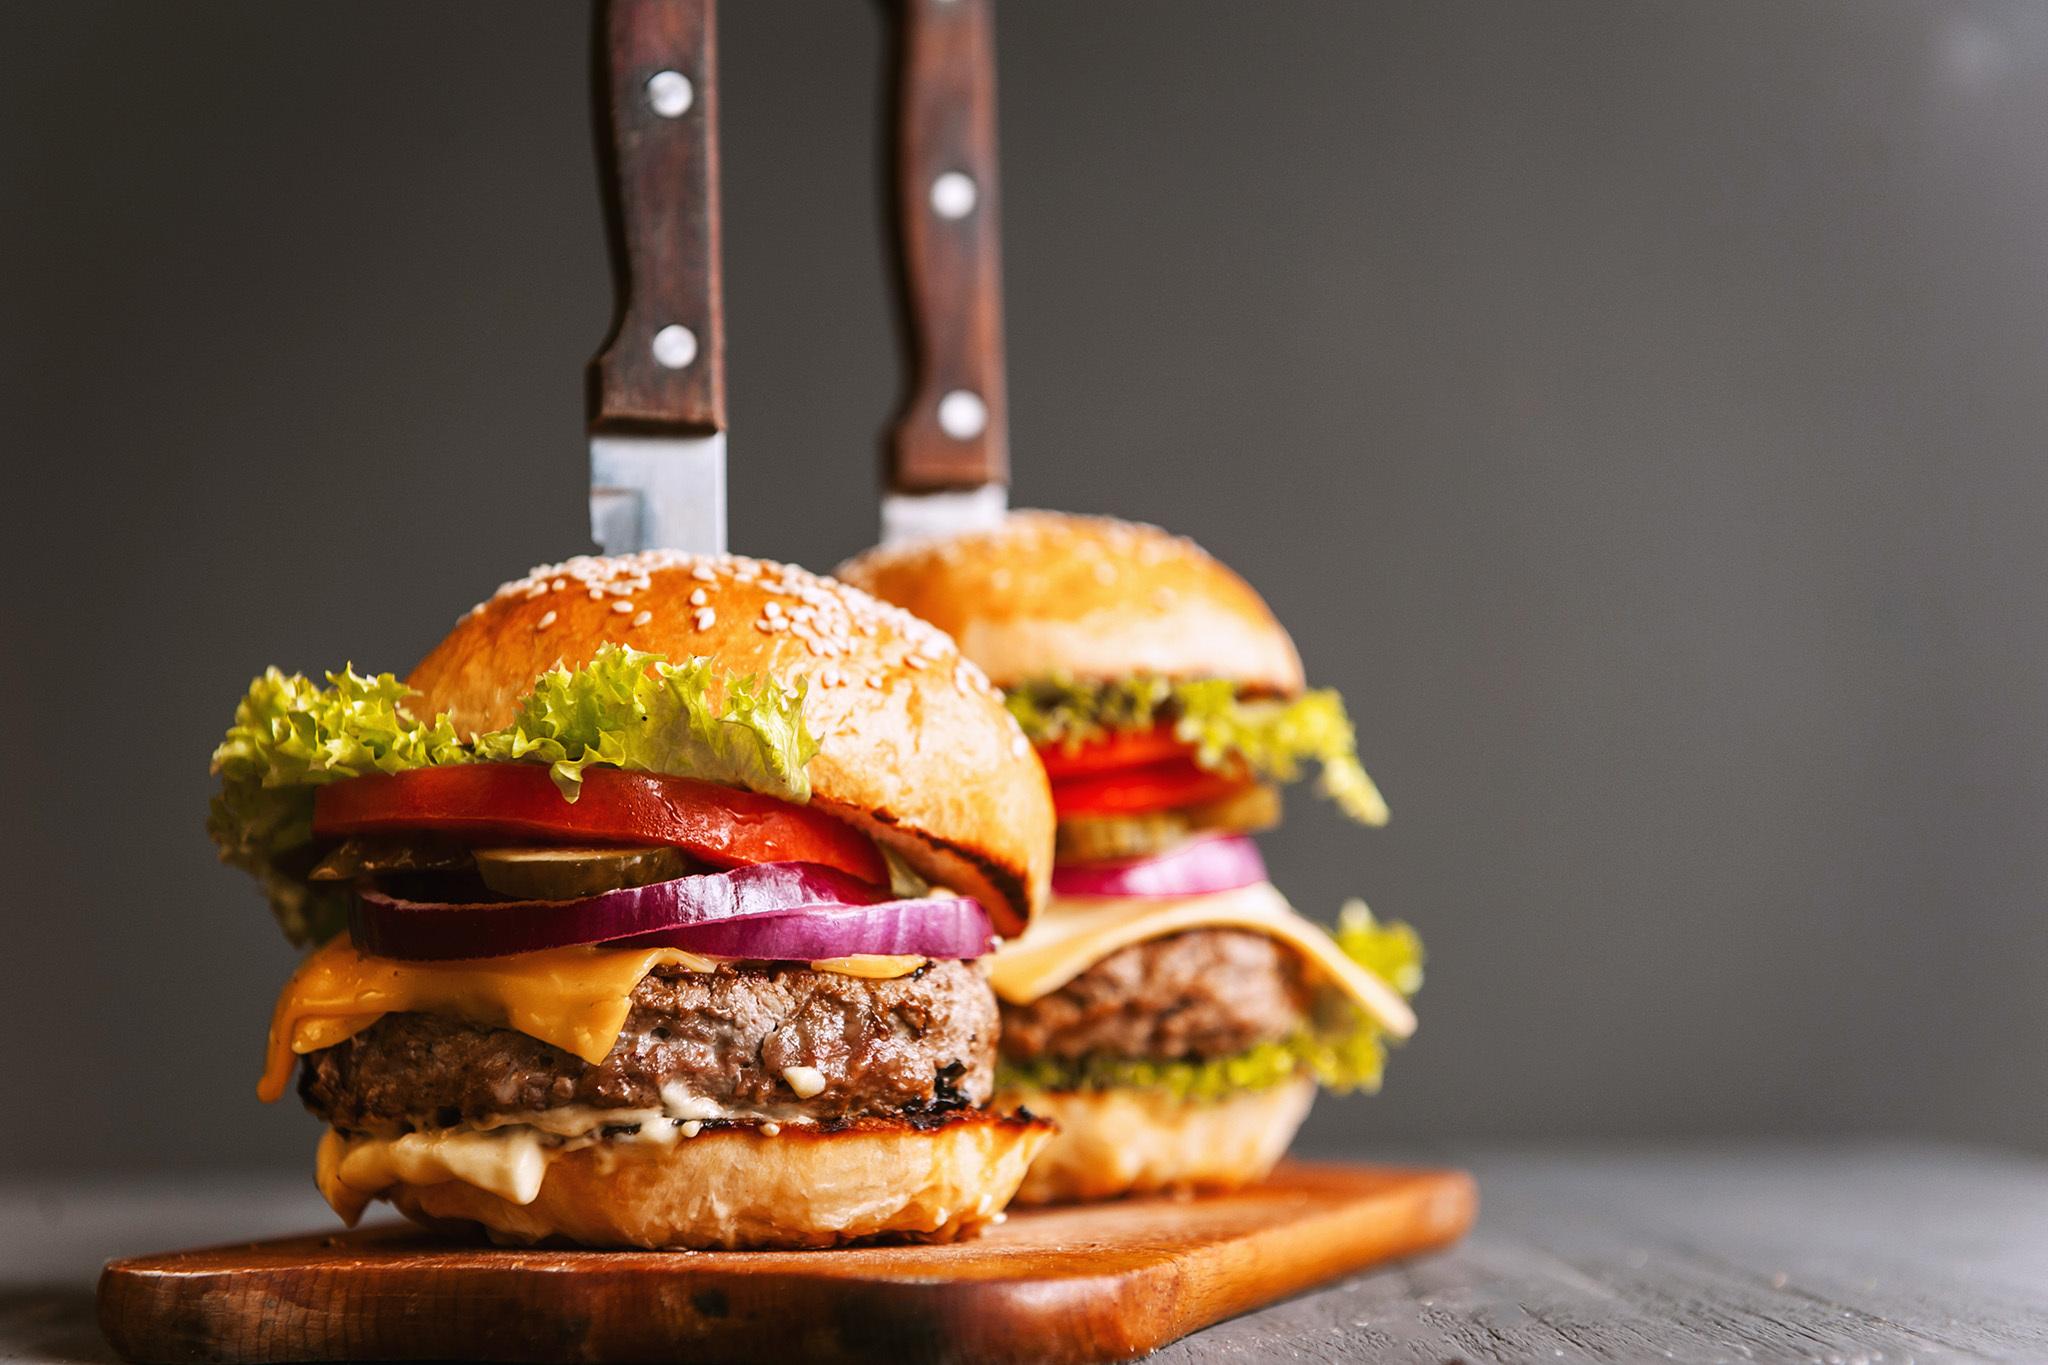 Battle of the Burger 2018